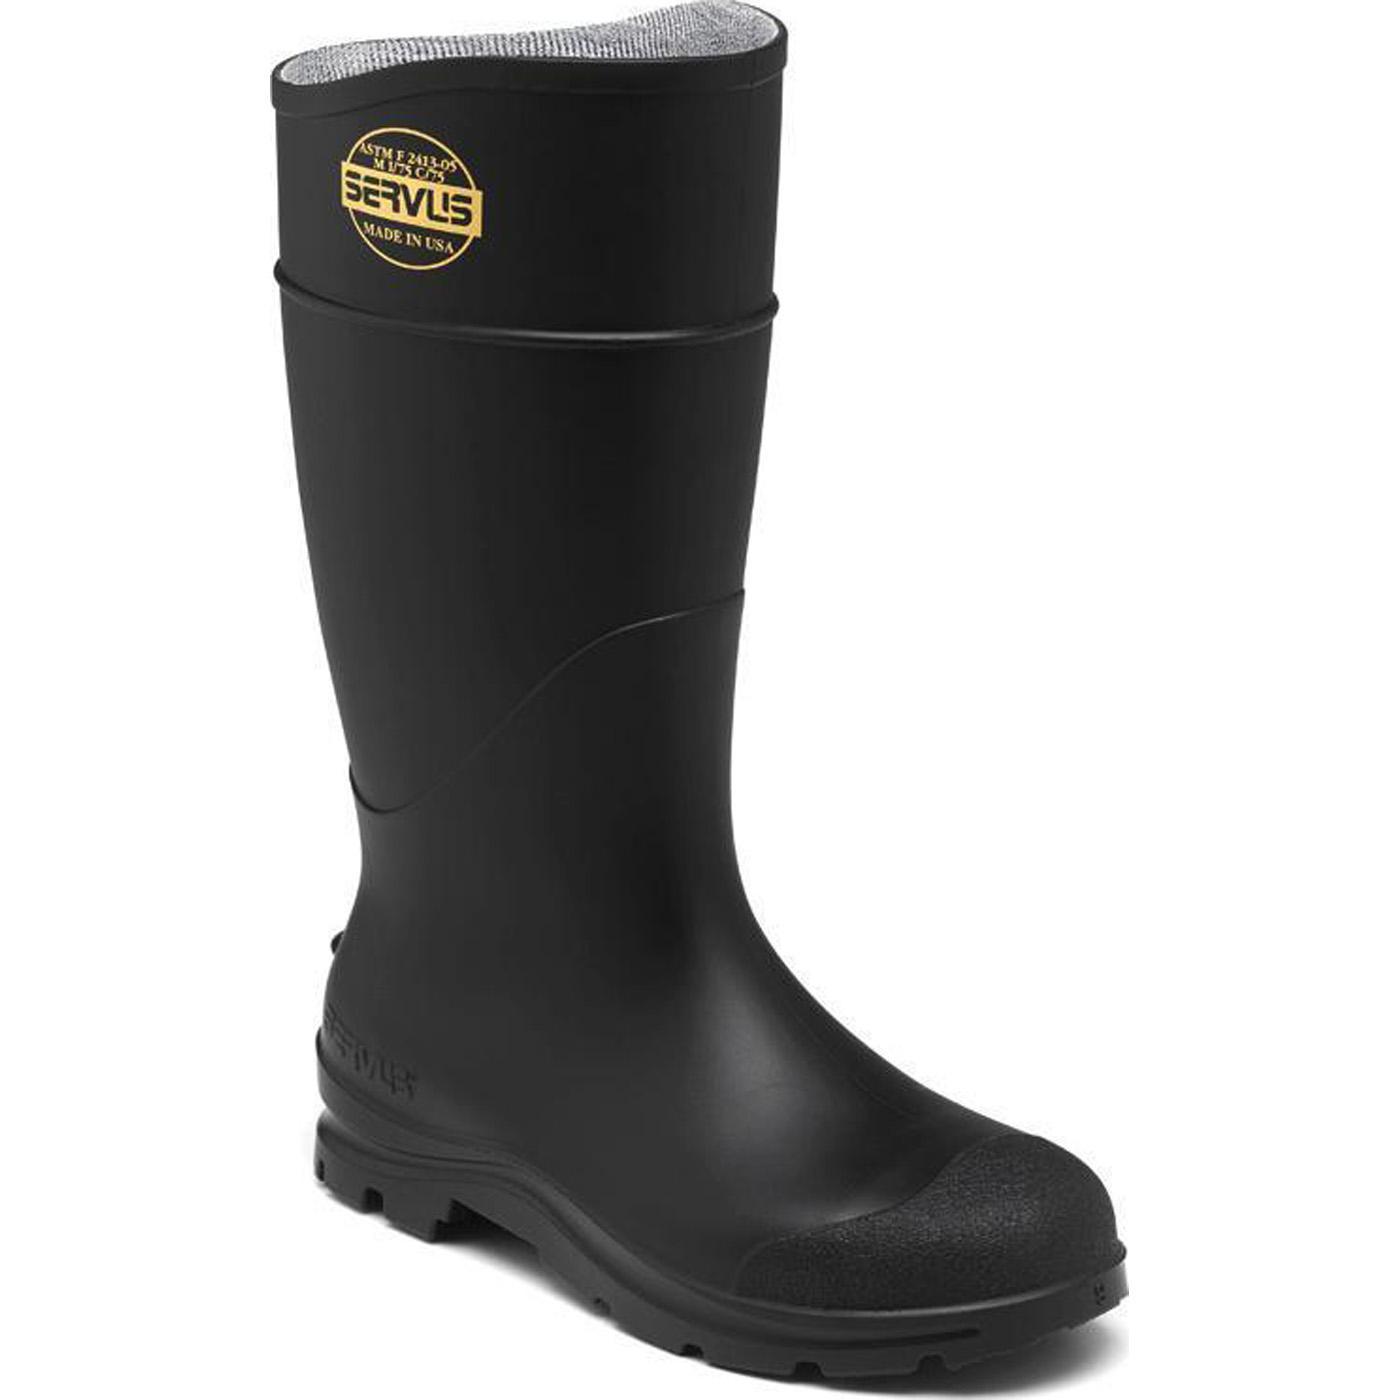 7f9432ec264 Servus® by Honeywell CT™ (Comfort Technology) Steel Toe PVC Waterproof Work  Boot